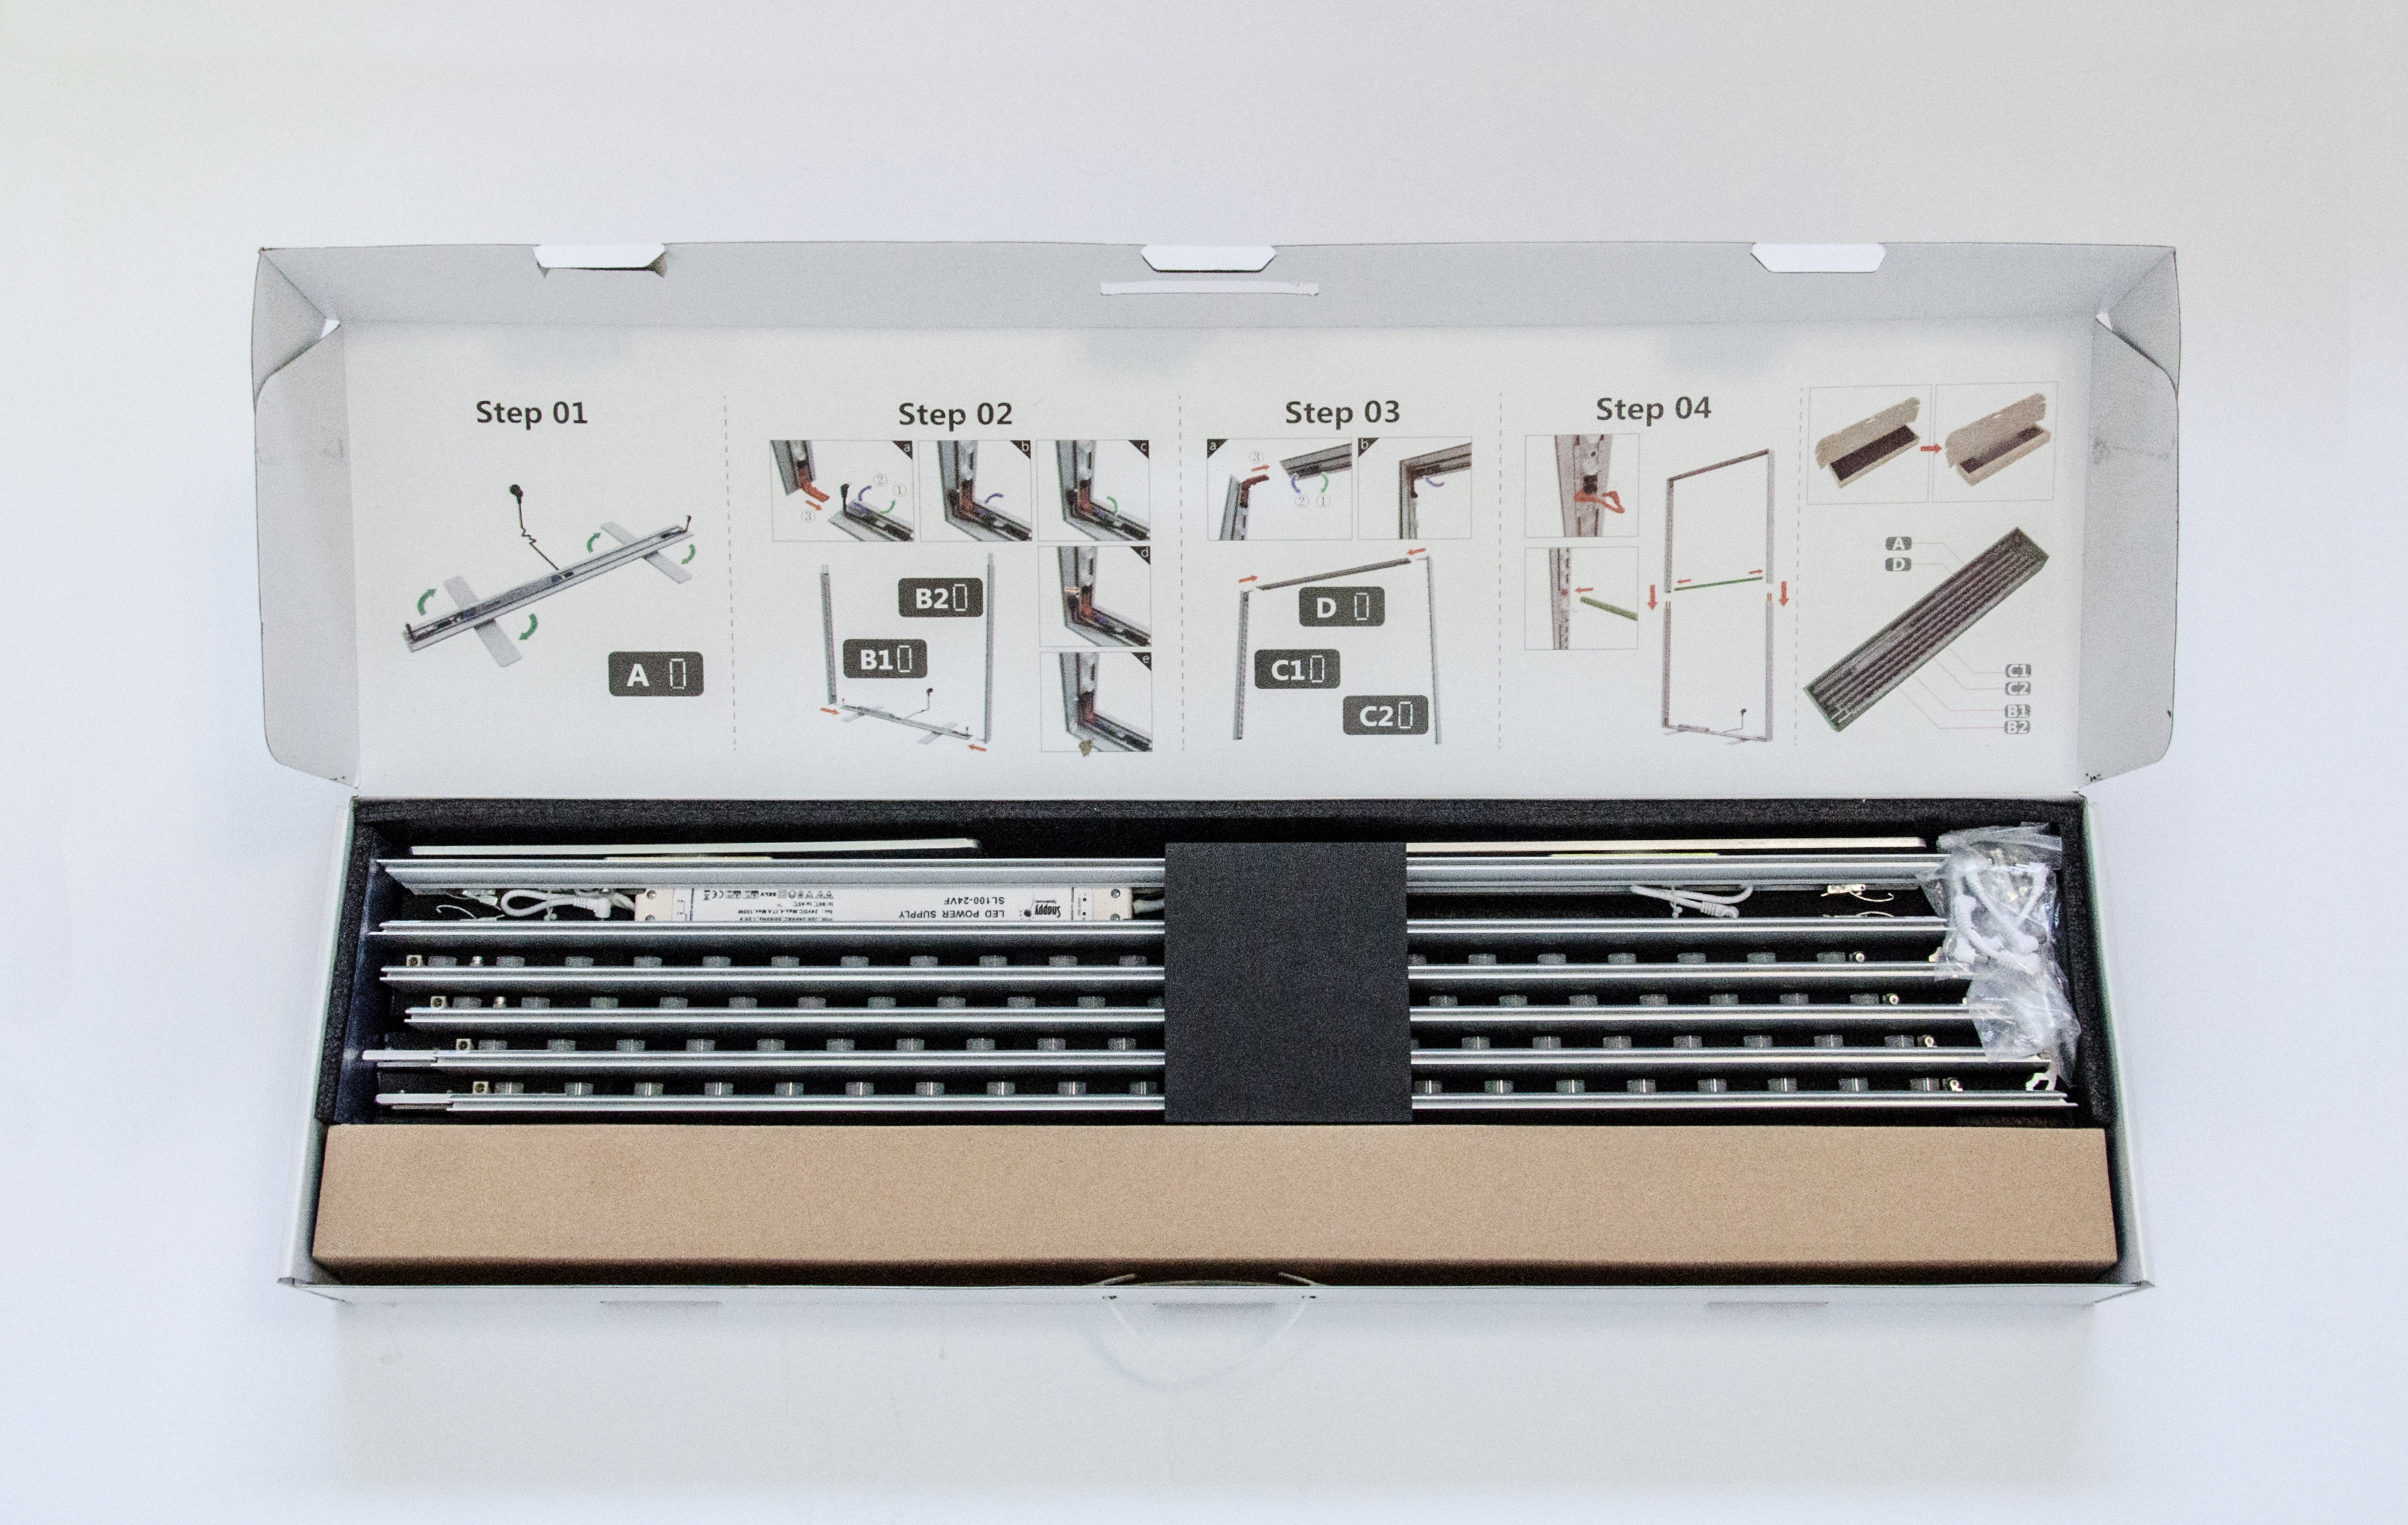 Caisson lumineux portable Helios 100 x 200 cm Objets publicitaires  personnalisation  FRANCE SUD PIERRE BE DISPLAY goodies personnalisation marseille